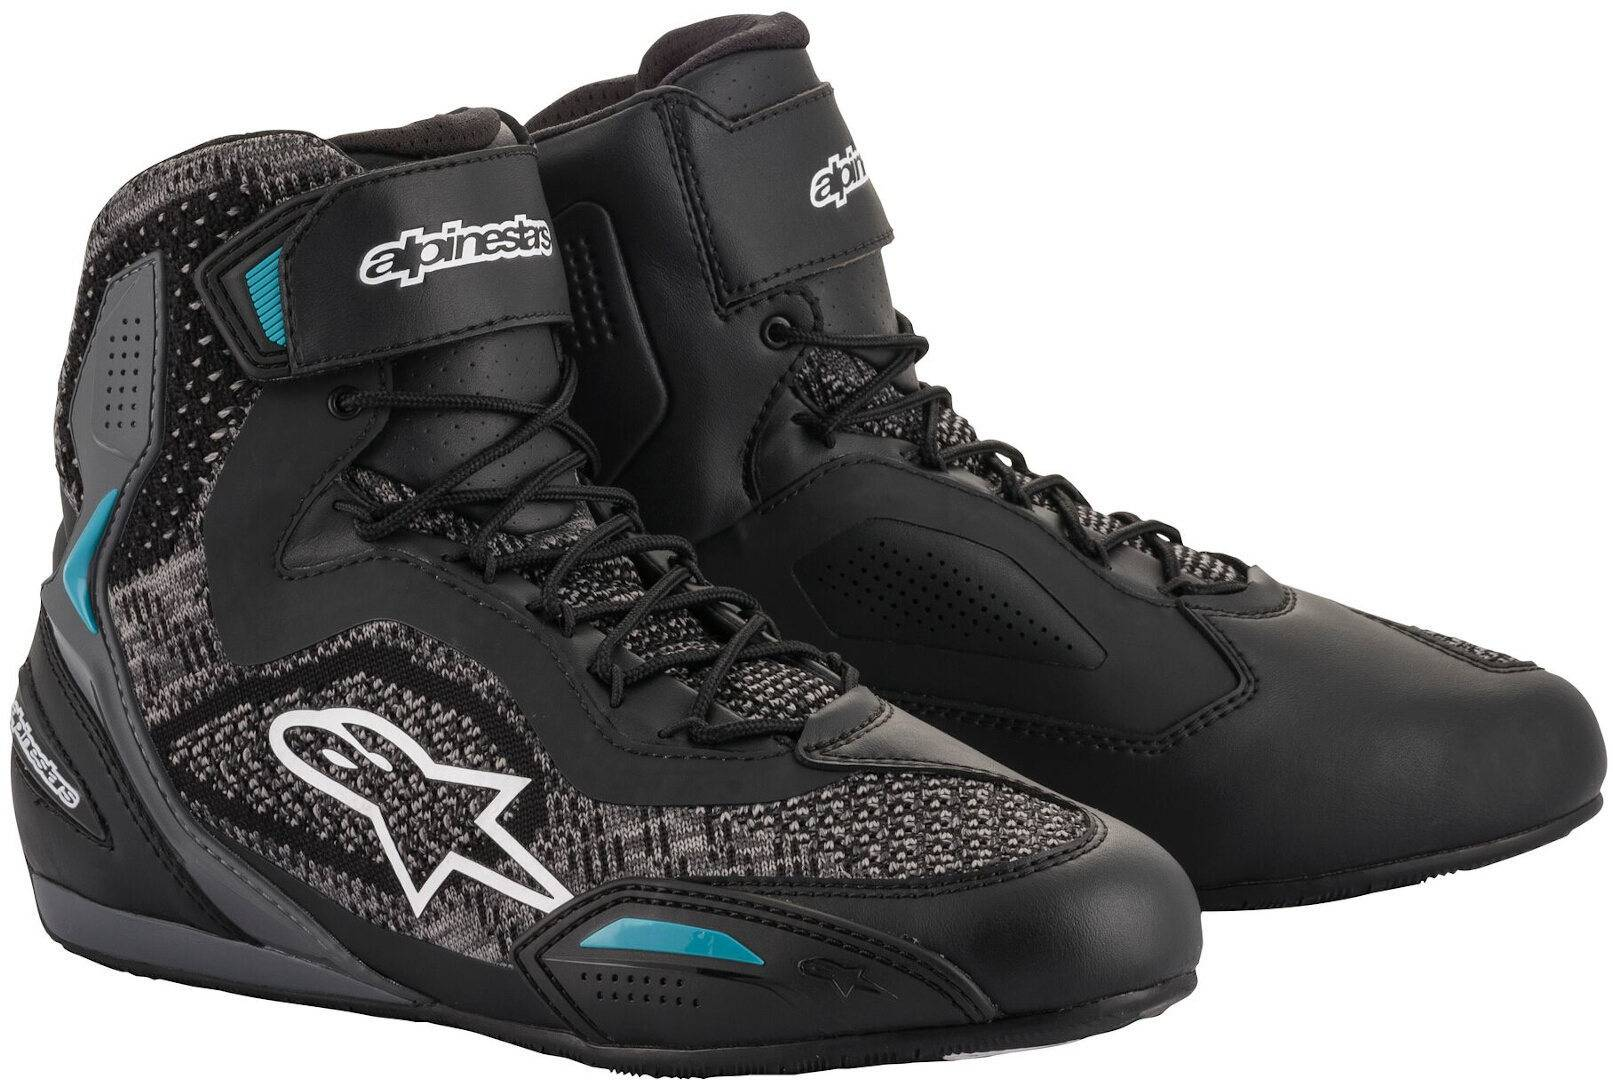 Alpinestars Stella Faster 3 Rideknit Chaussures de moto dames Noir Blanc Bleu taille : 41